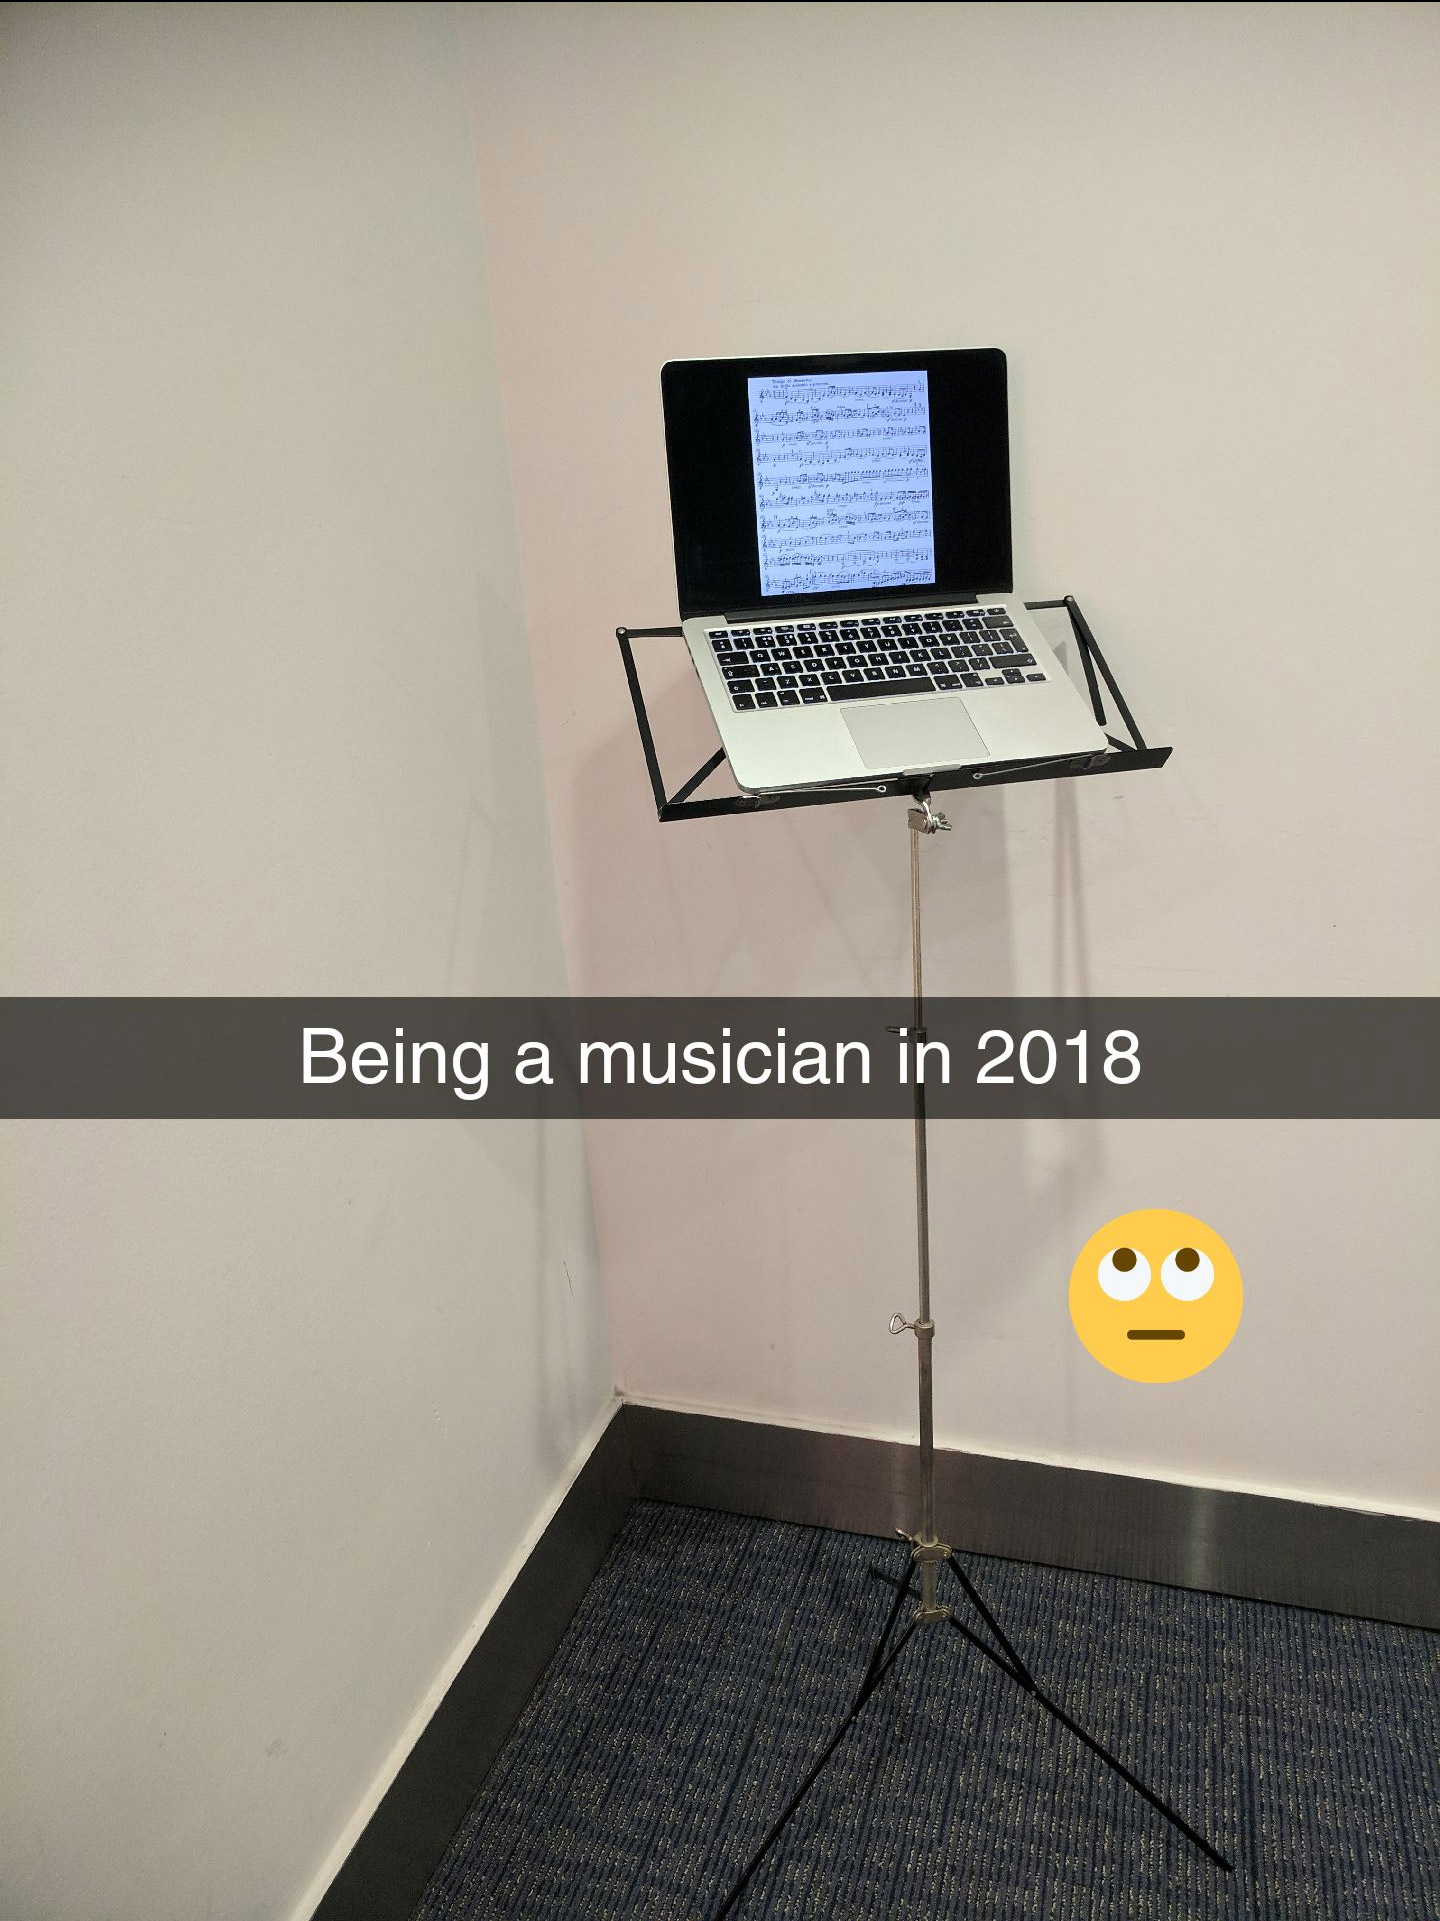 musician in 2018